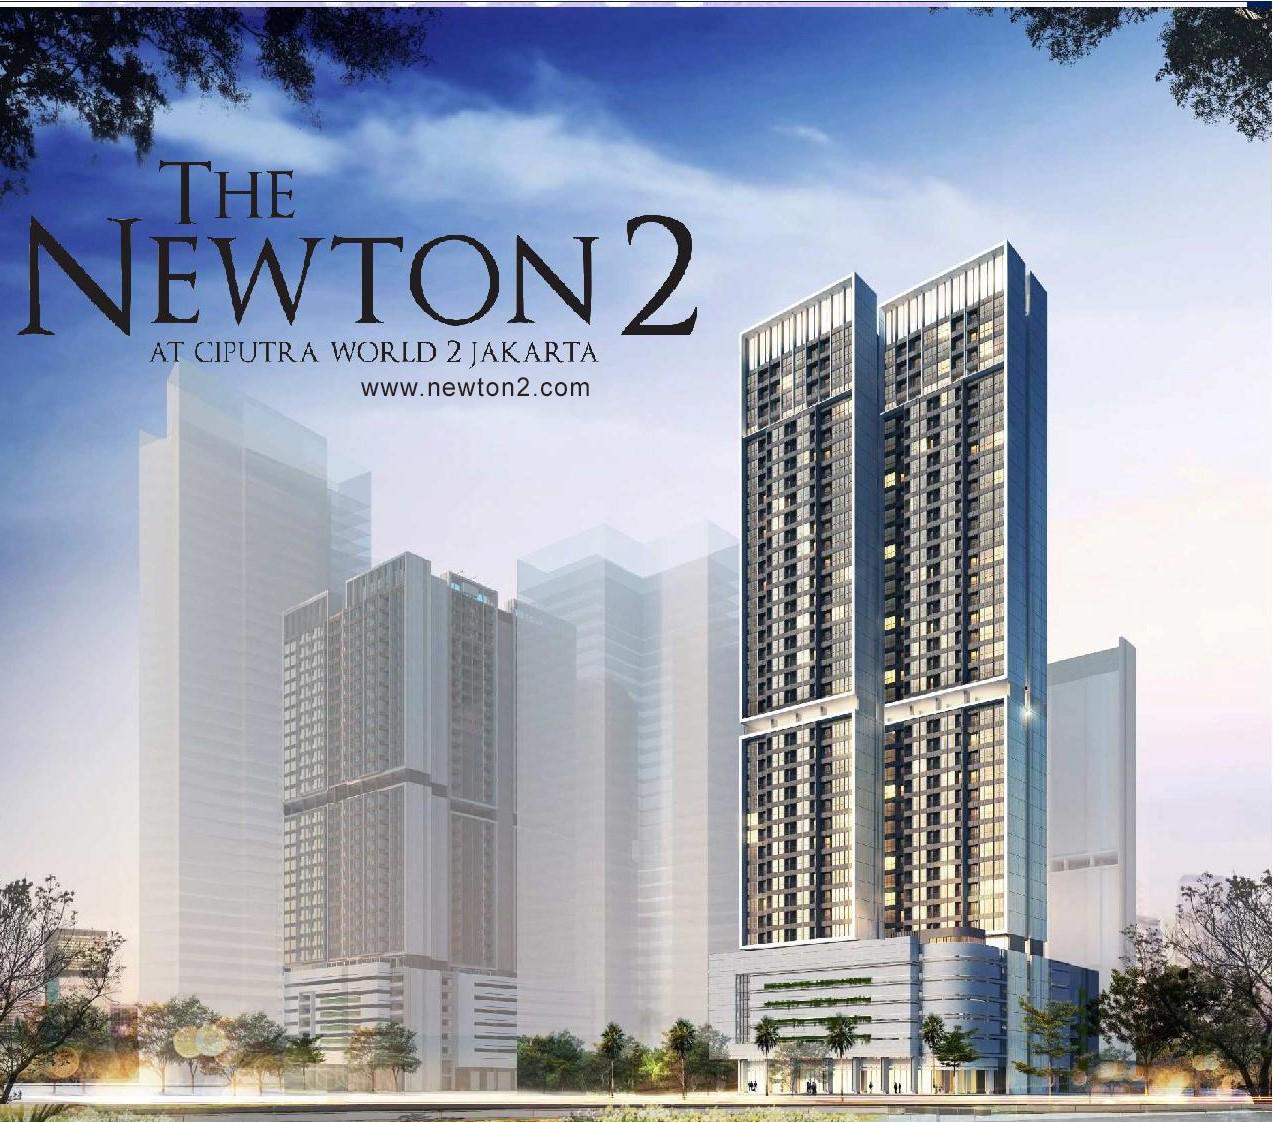 Newton 2 Ciputra